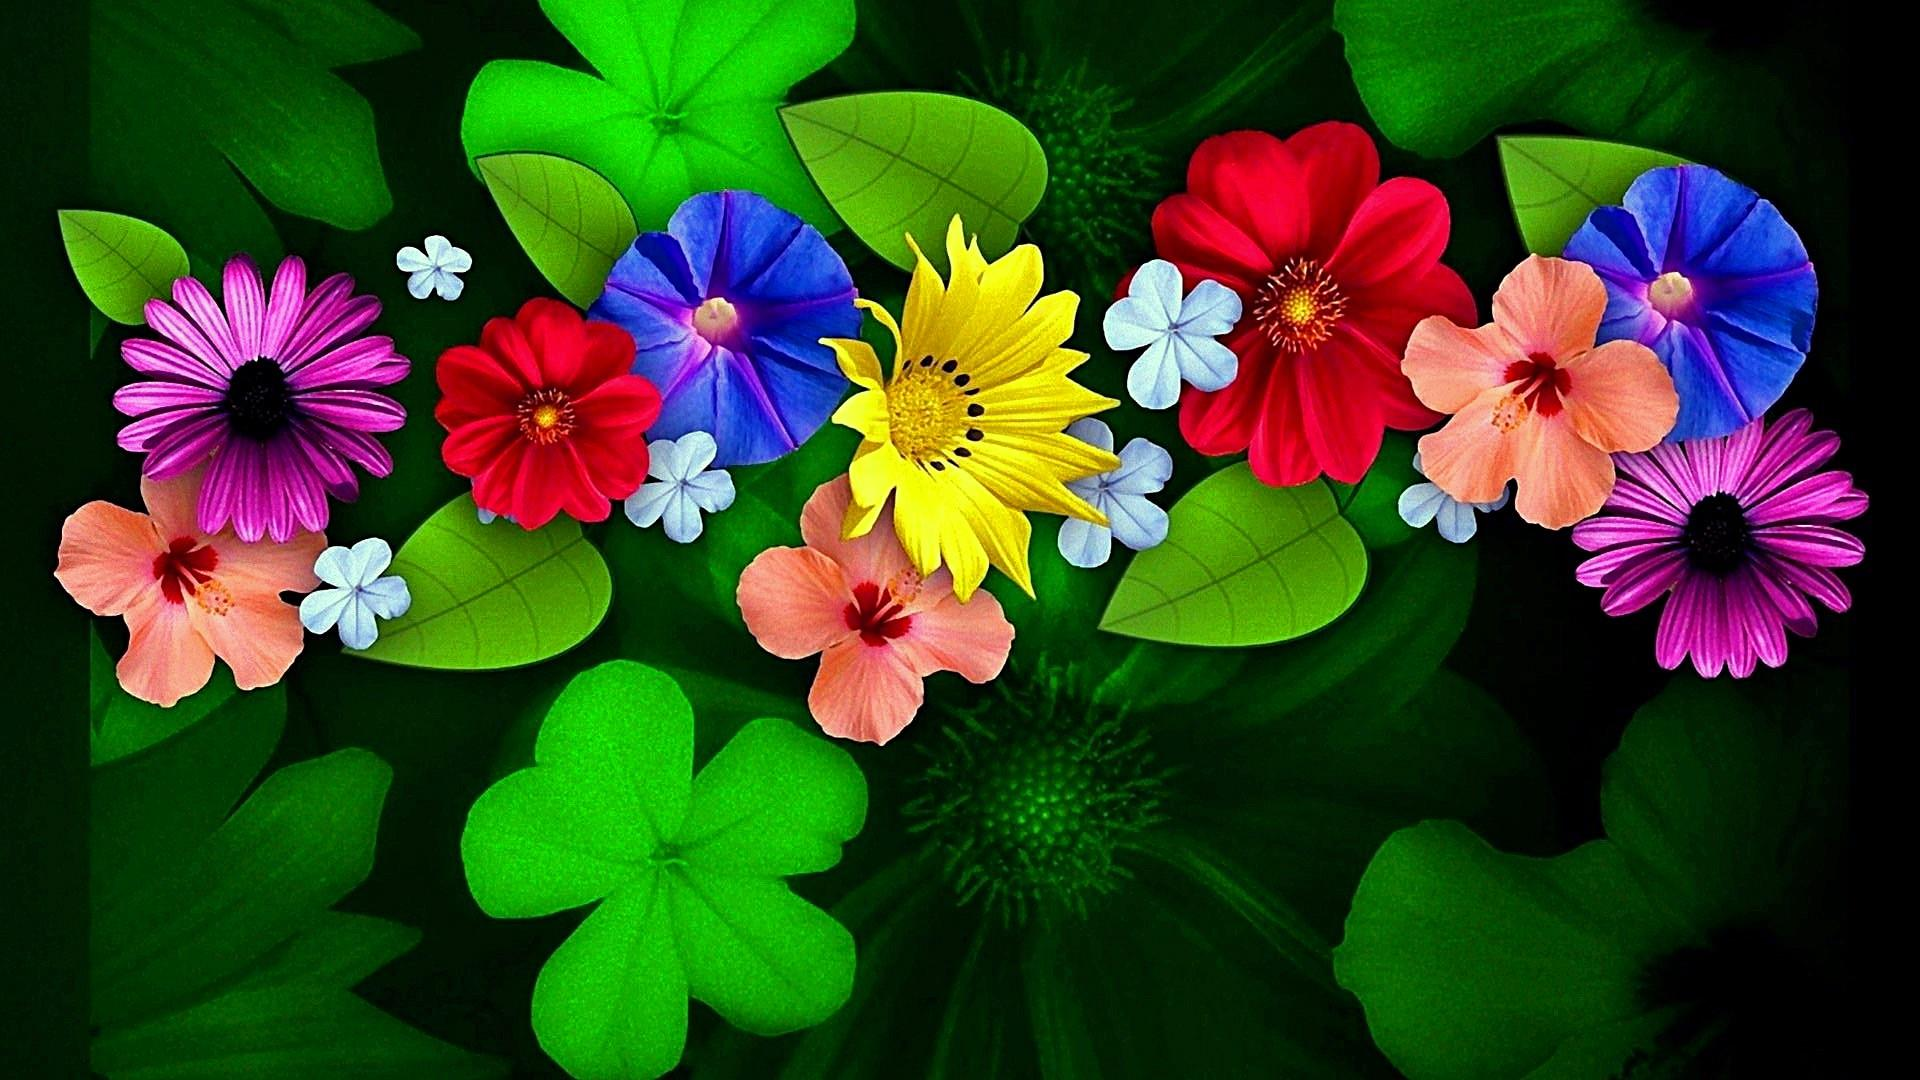 4k Flowers Wallpaper Green Flower Wallpaper Hd 357510 Hd Wallpaper Backgrounds Download